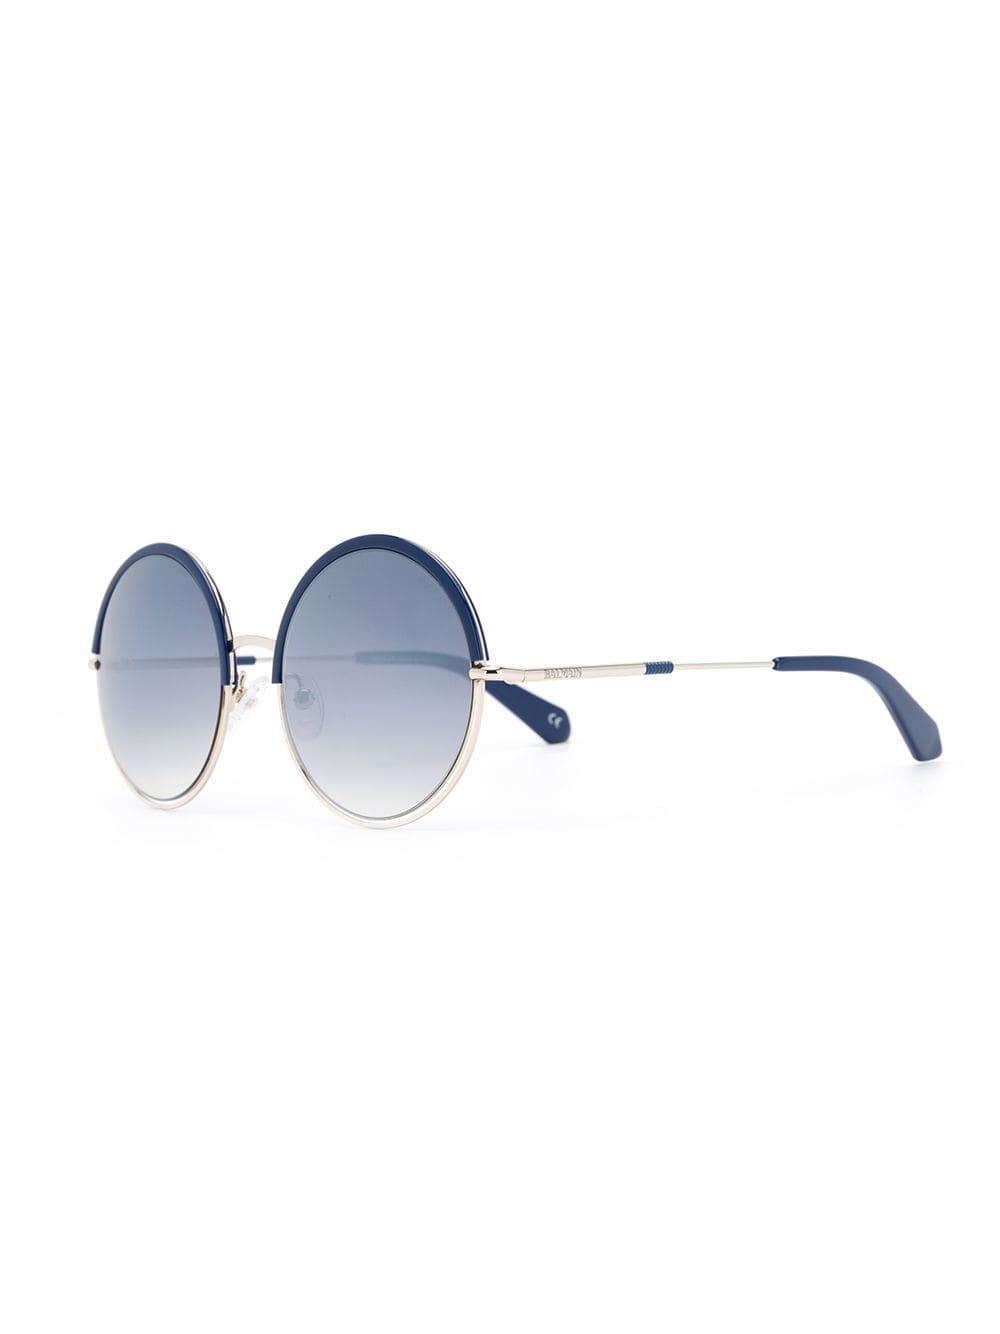 3a22c56ce3 Balmain - Blue Round Frame Sunglasses - Lyst. View fullscreen